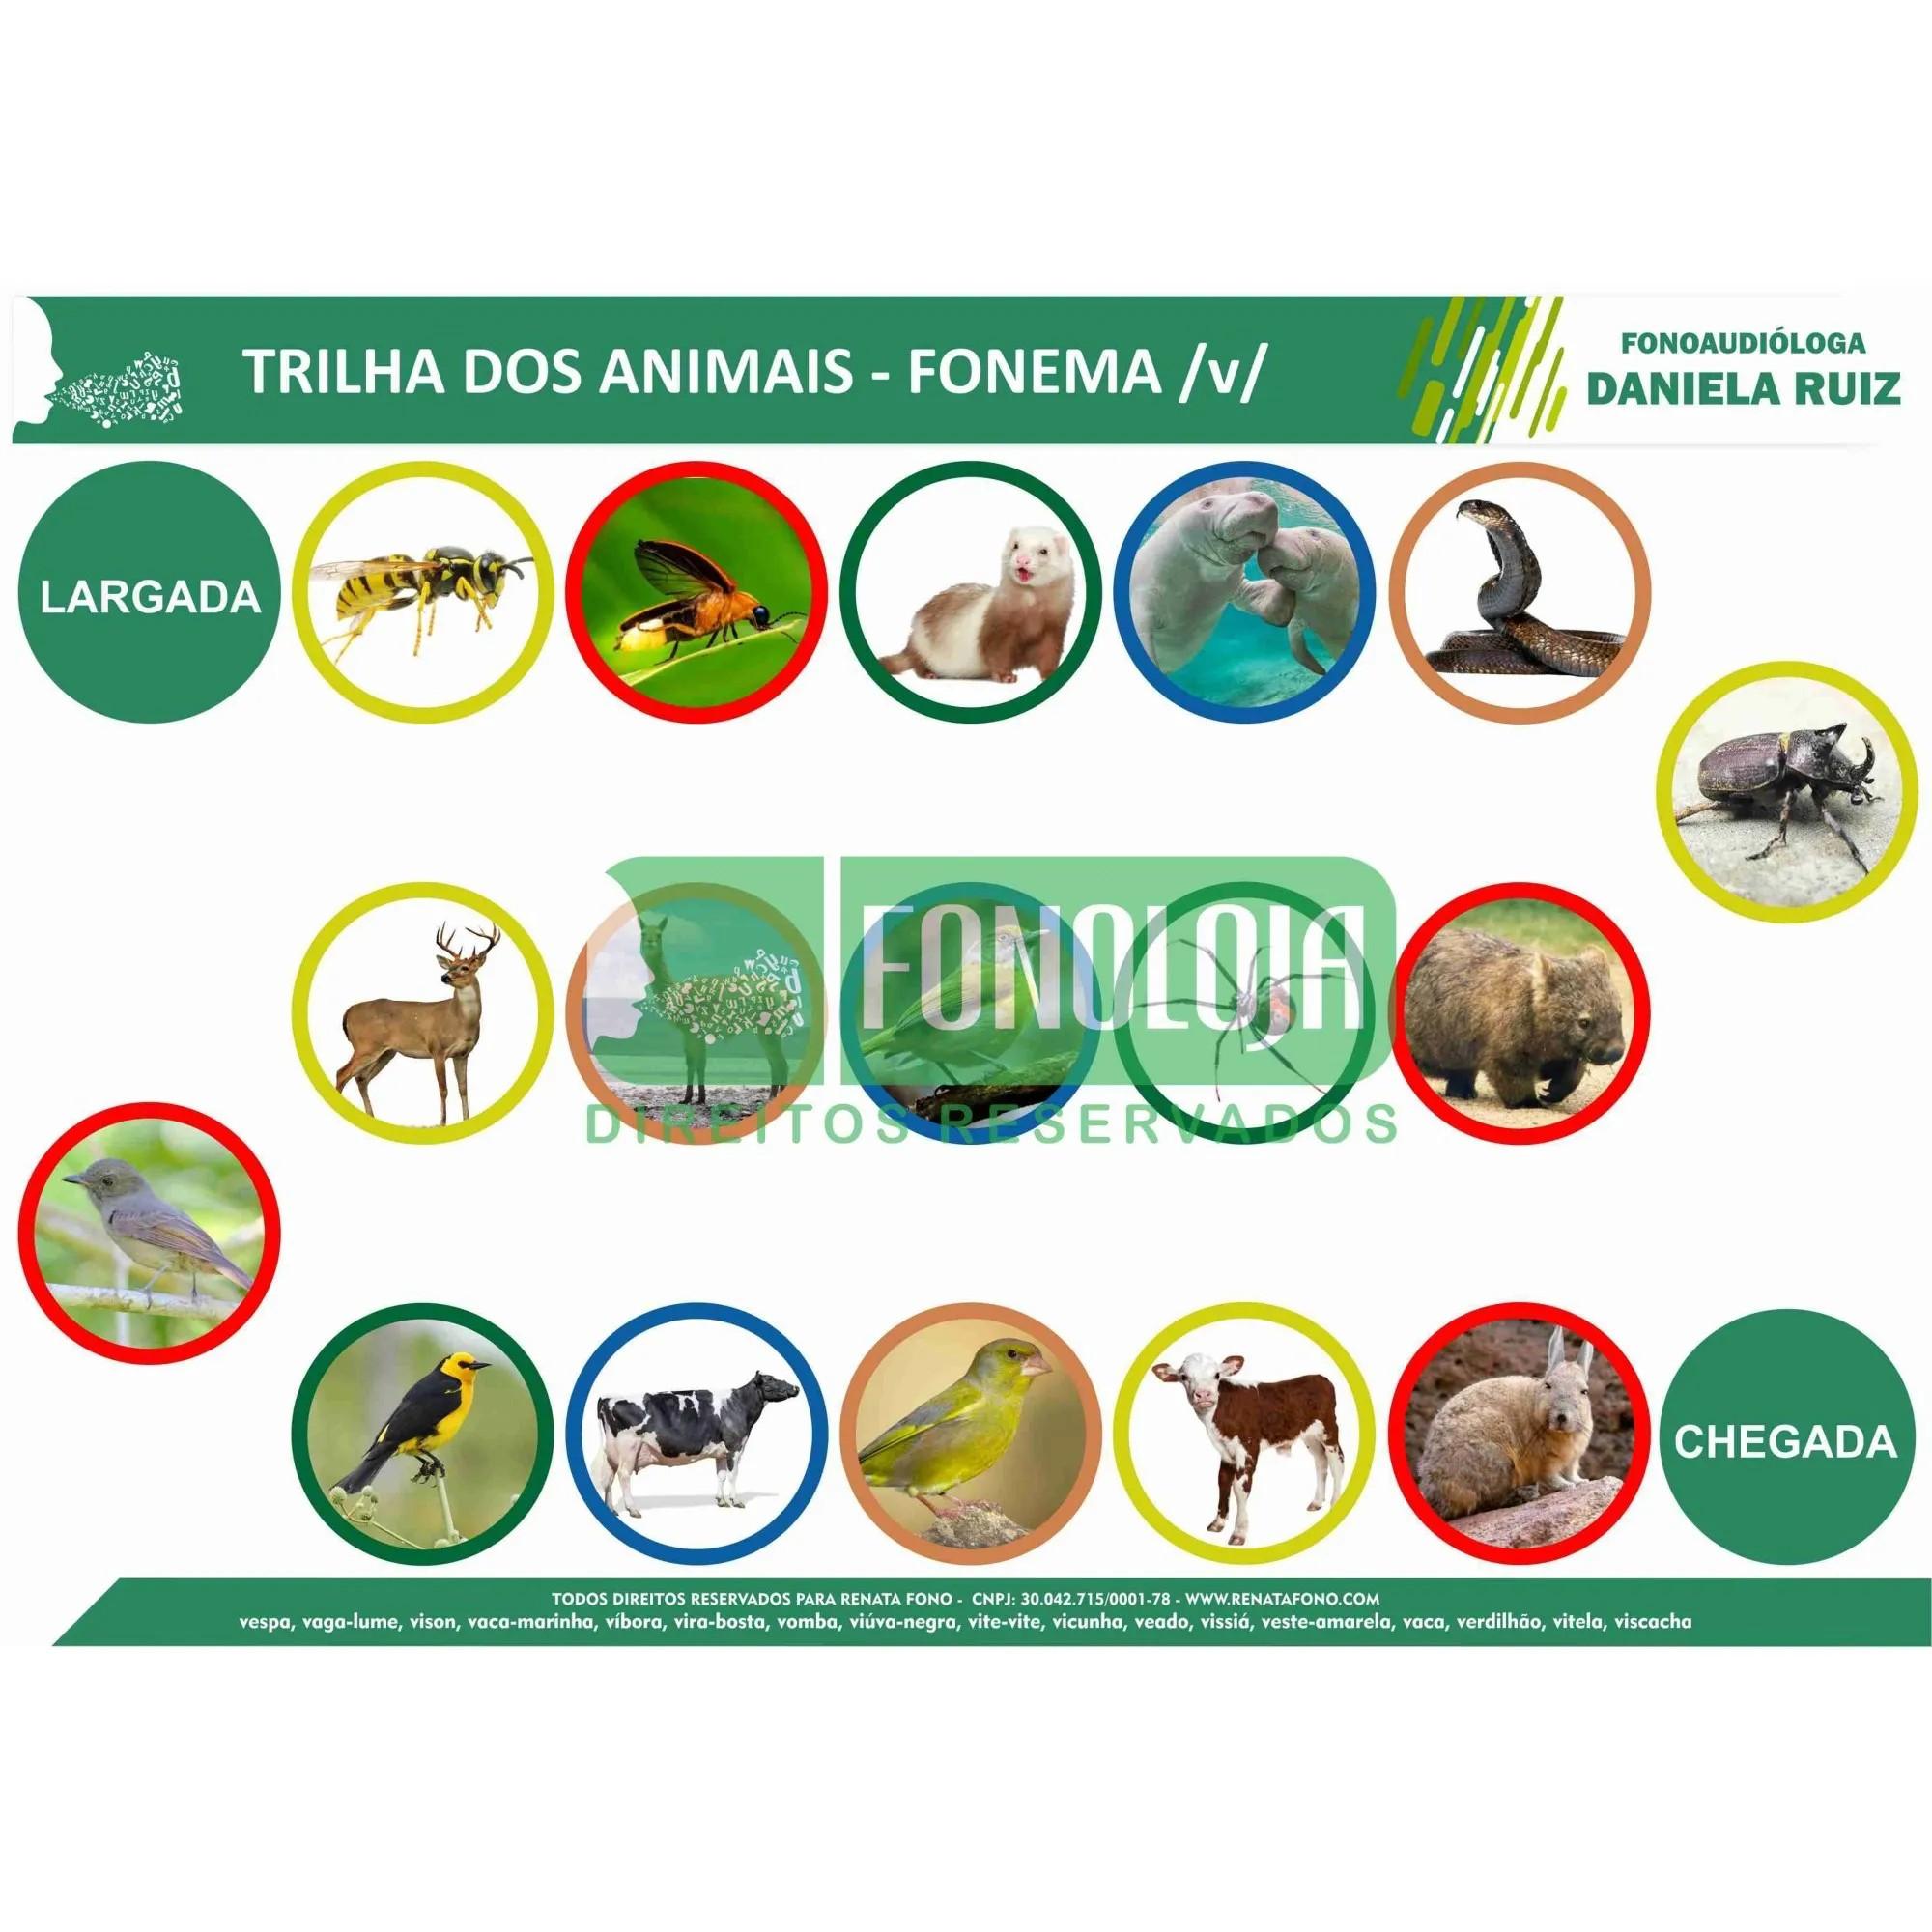 KIT 22 - 06 PRANCHAS JOGOS DE TRILHA FONEMAS FRICATIVOS - FORMATO DIGITAL